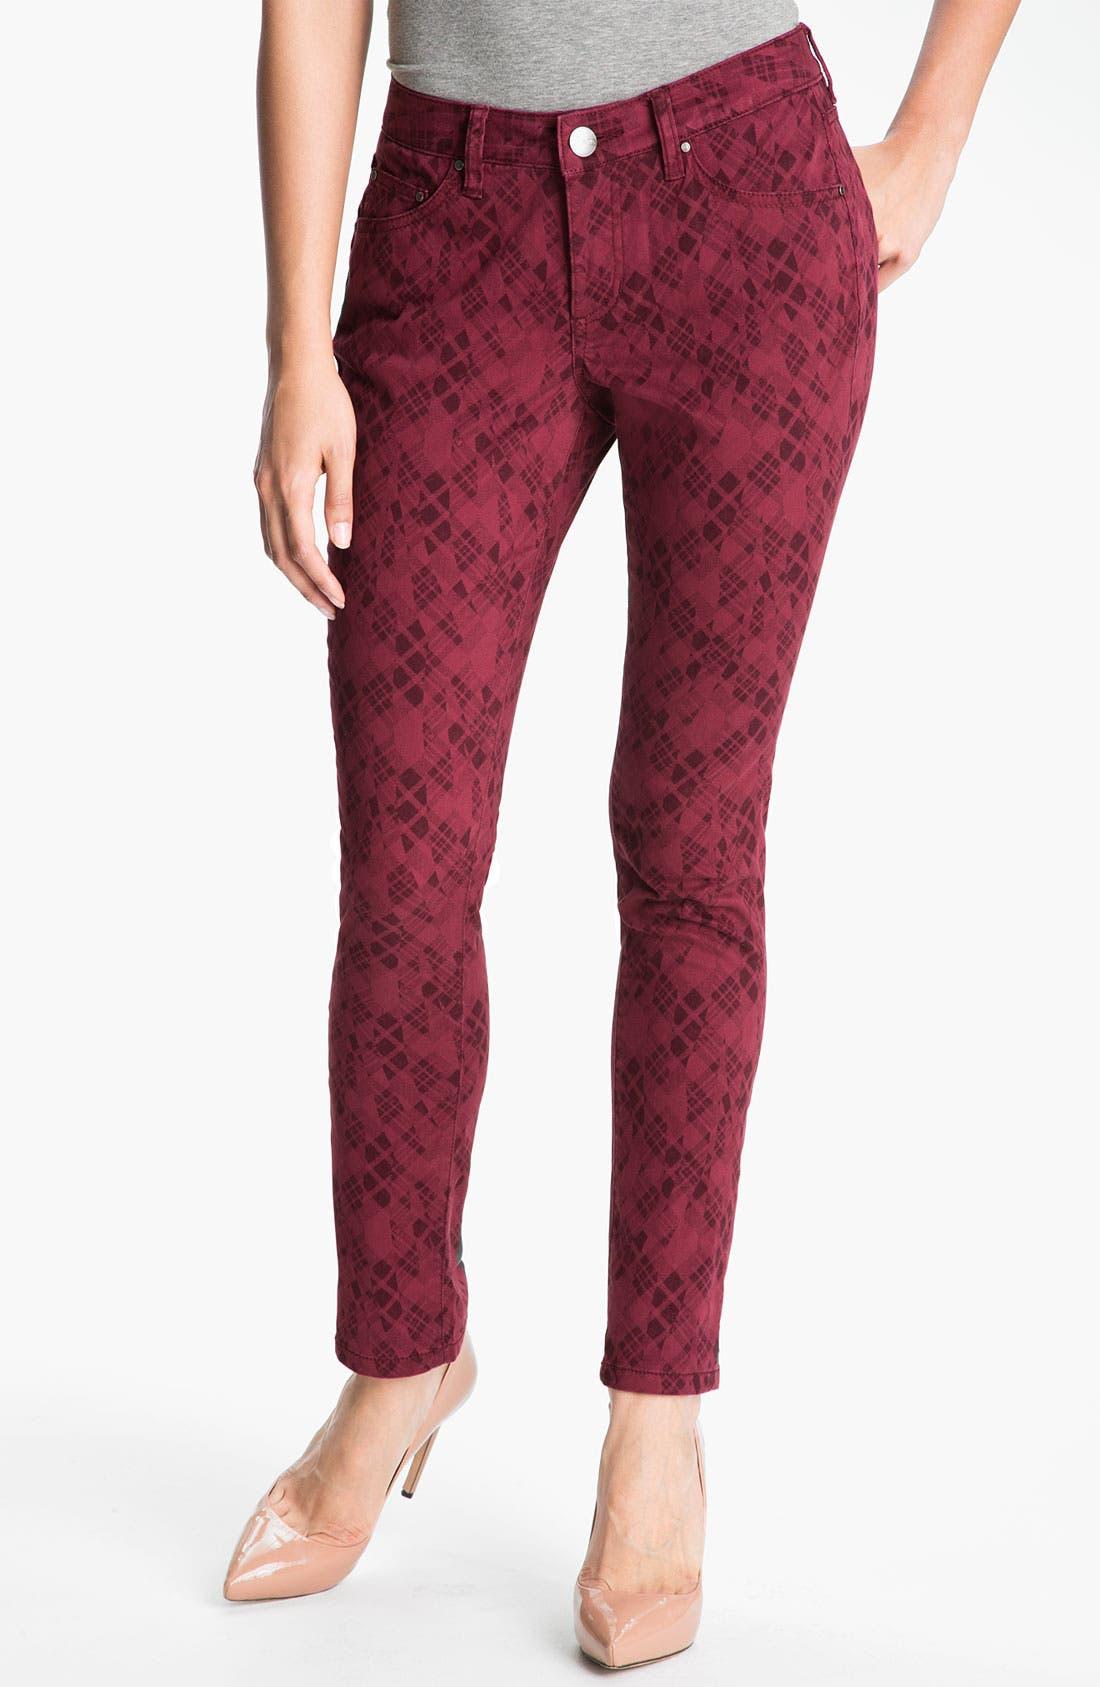 Alternate Image 1 Selected - Jag Jeans 'Chloe - Kingston Plaid' Skinny Jeans (Online Exclusive)